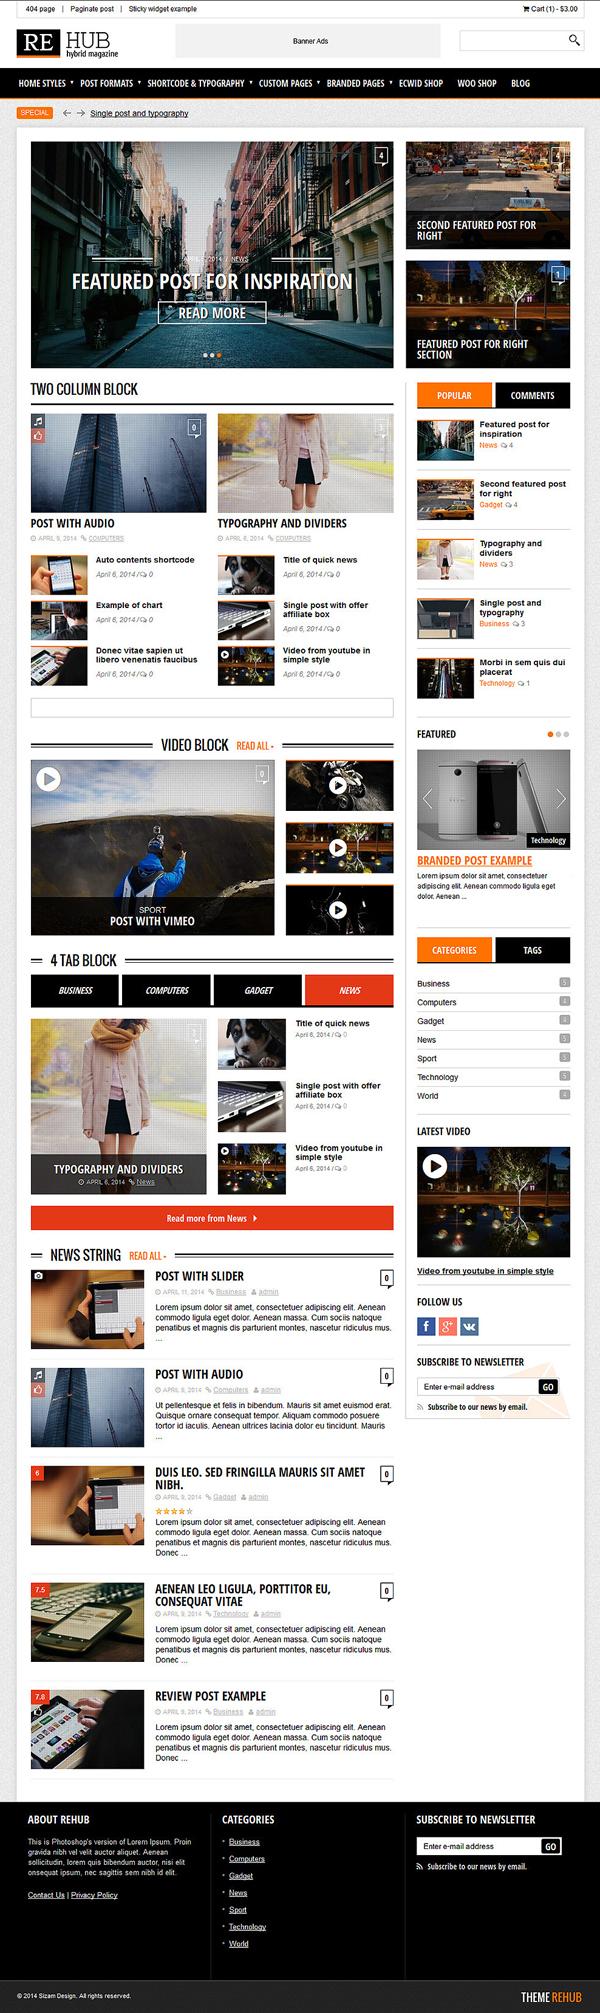 REHub - Hybrid News, Shop, Review, Affiliate WordPress Theme